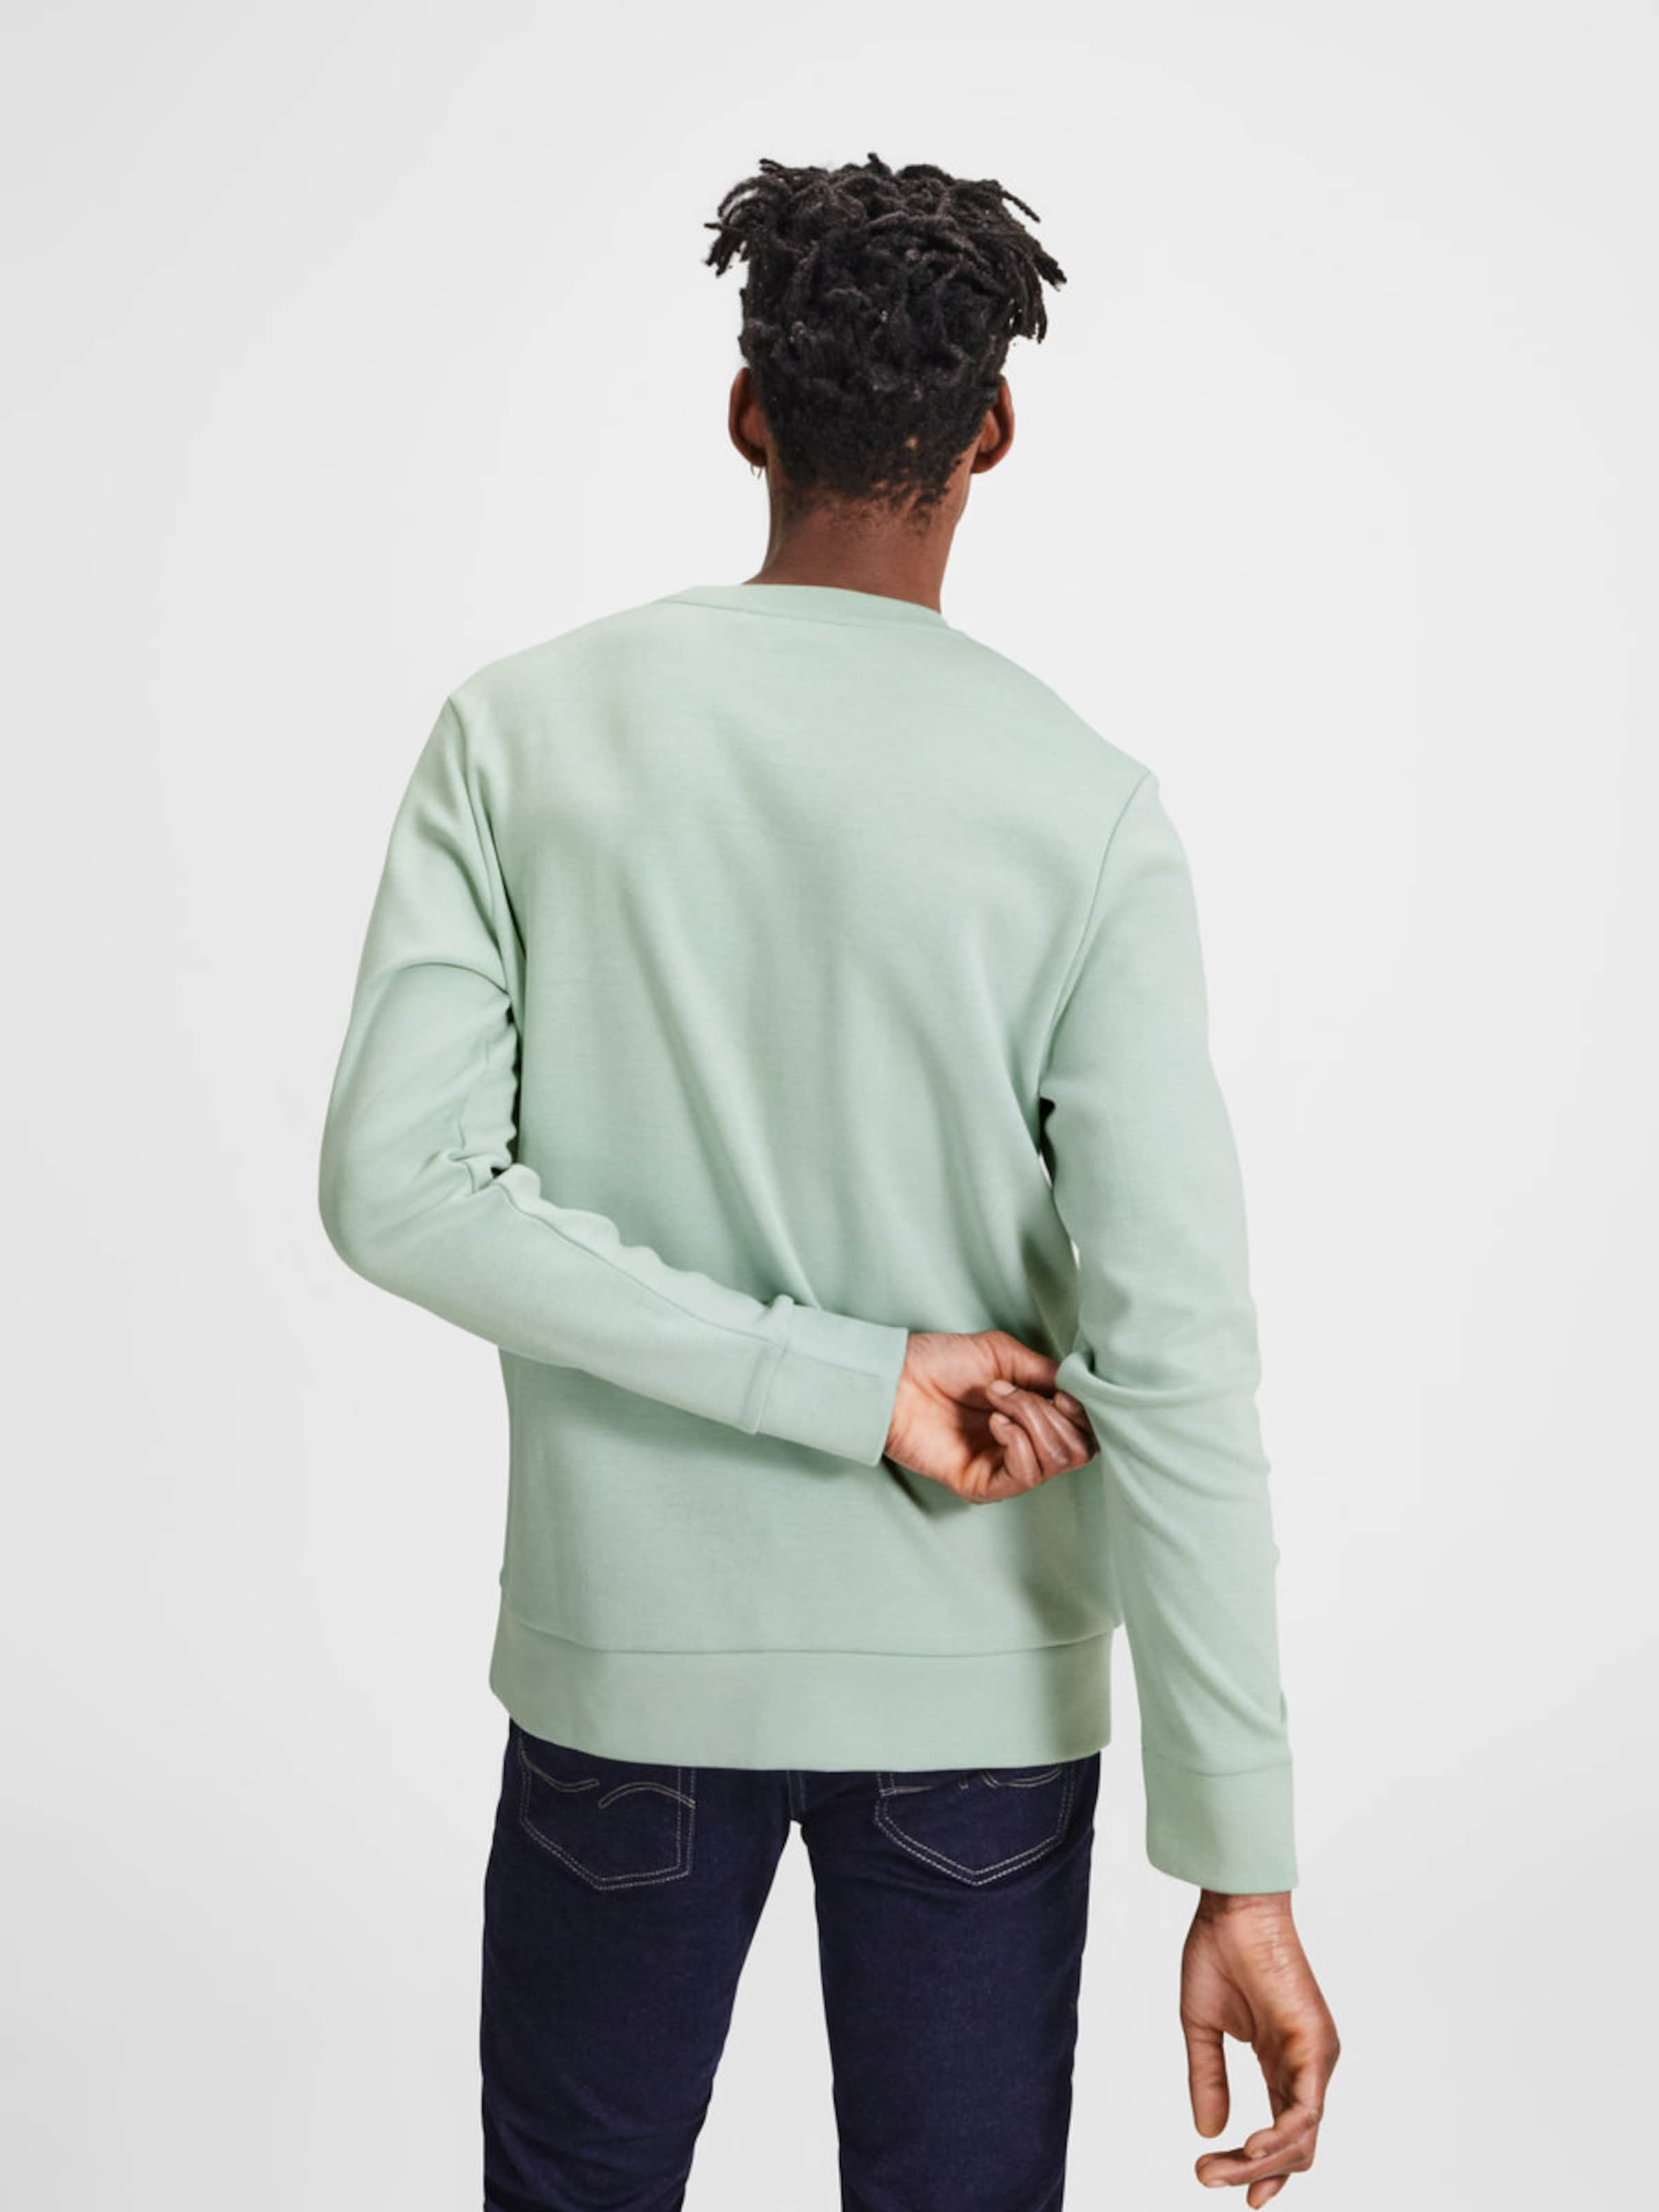 Spielraum Nicekicks JACK & JONES Lässiges Sweatshirt Billige Footaction k99UD